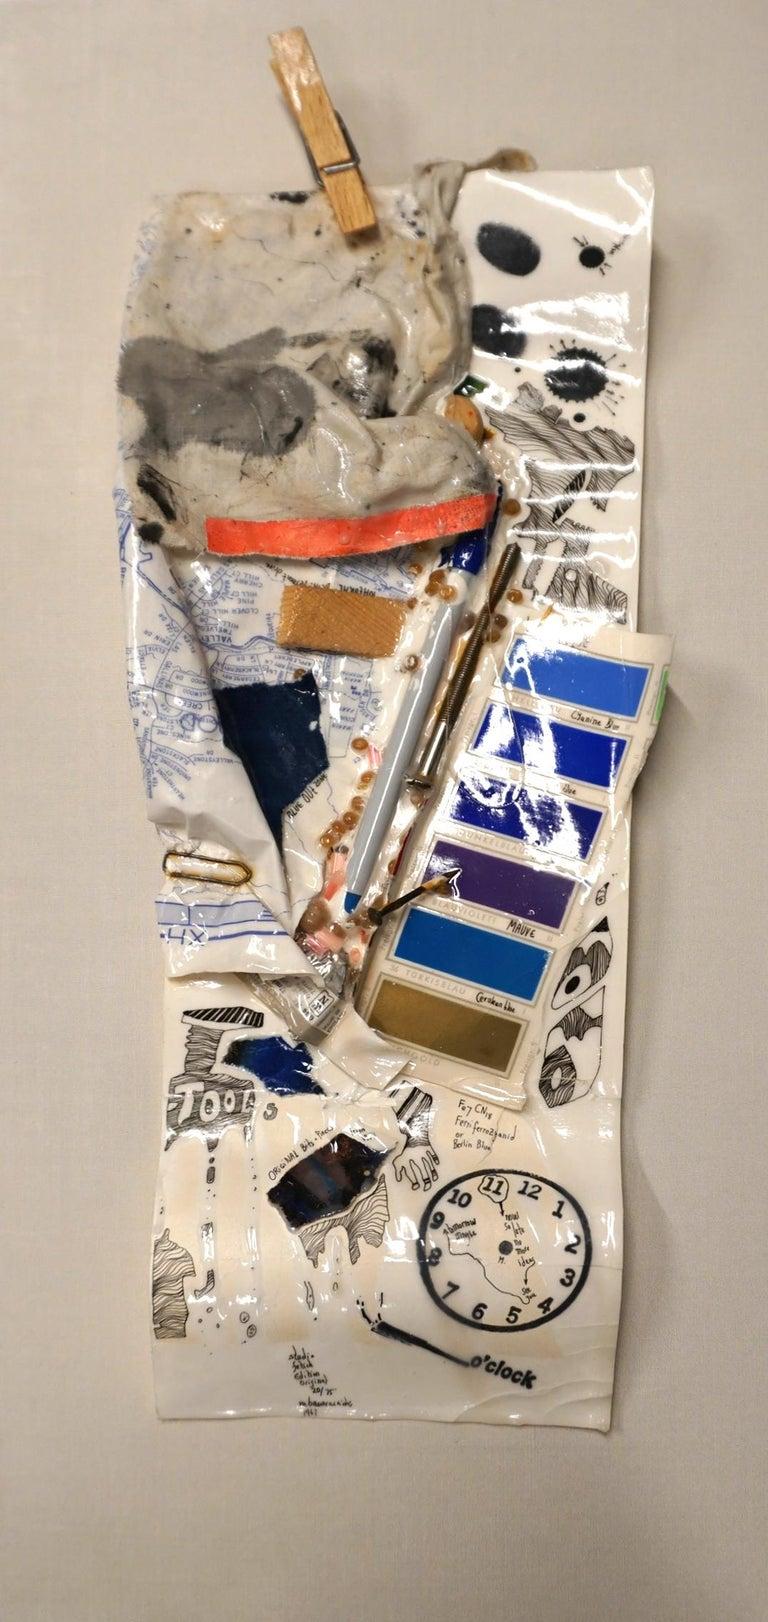 Mary Bauermeister Still-Life Sculpture - STUDIO FETICH